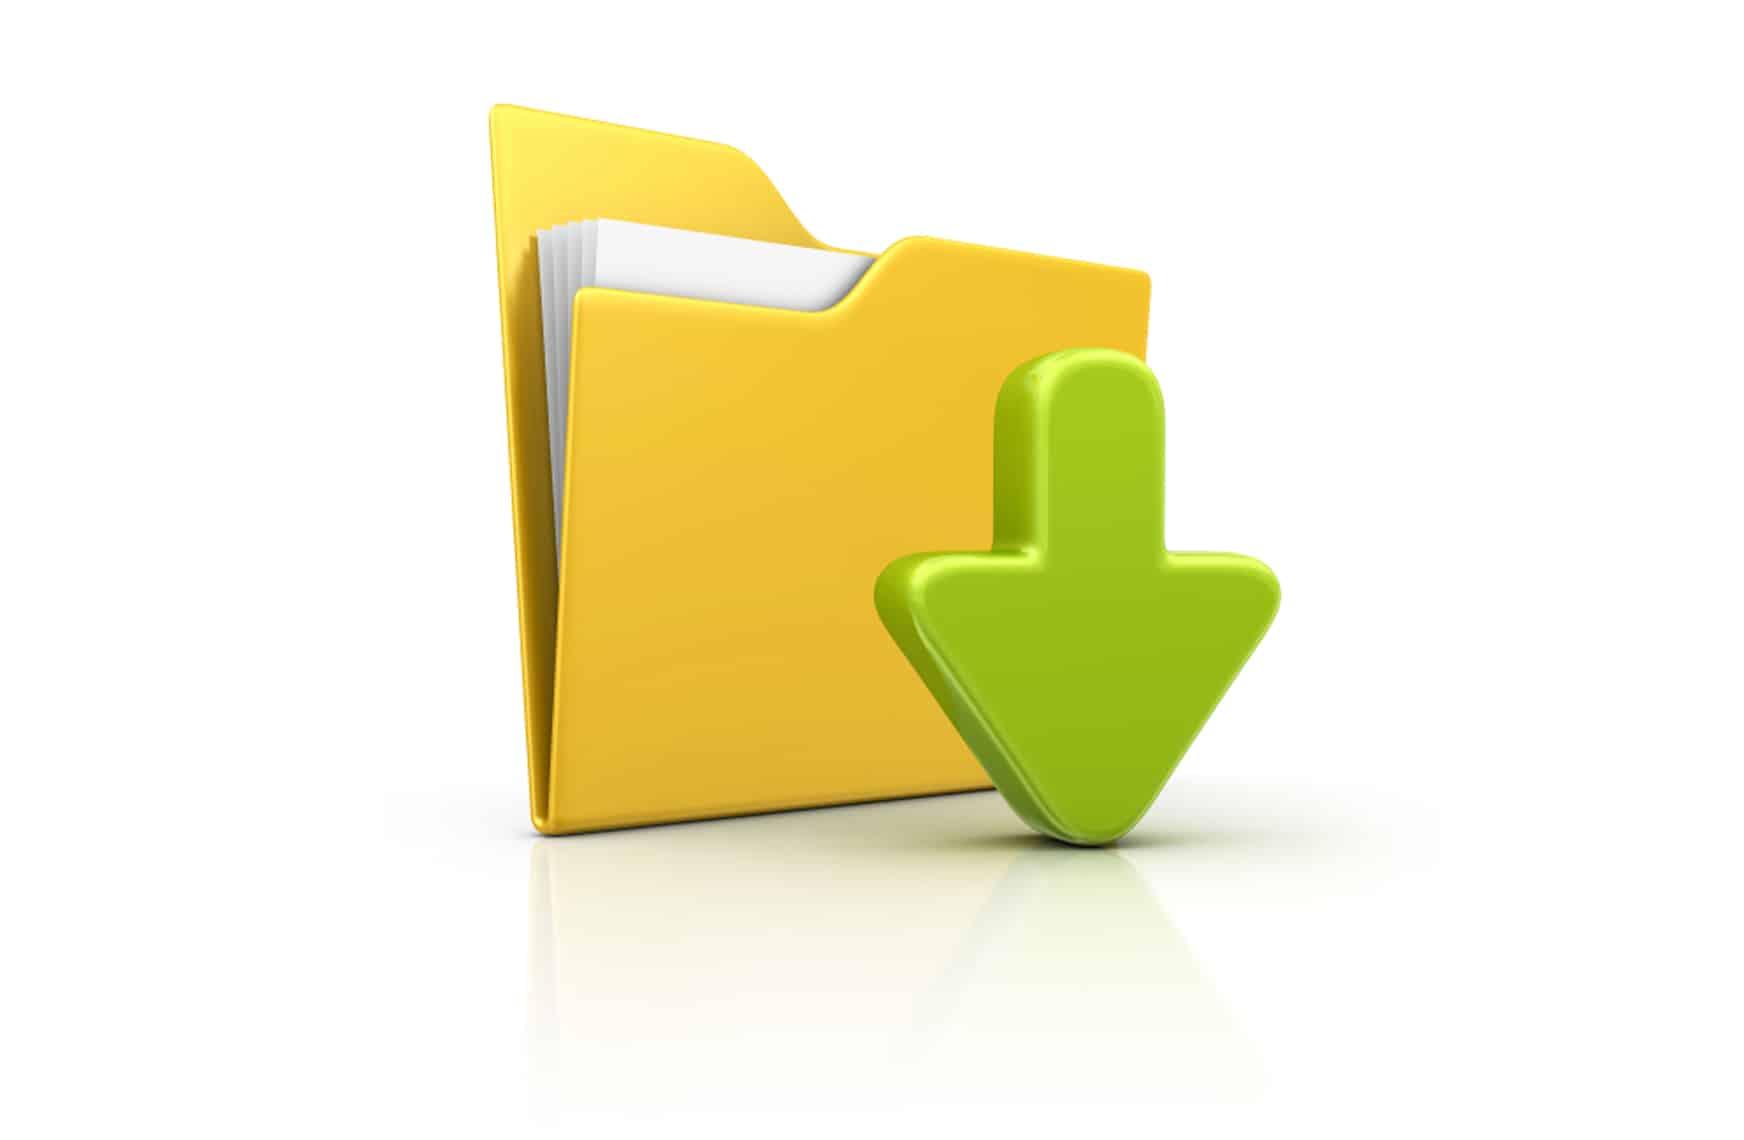 TECHGYO_Manage your data downloads